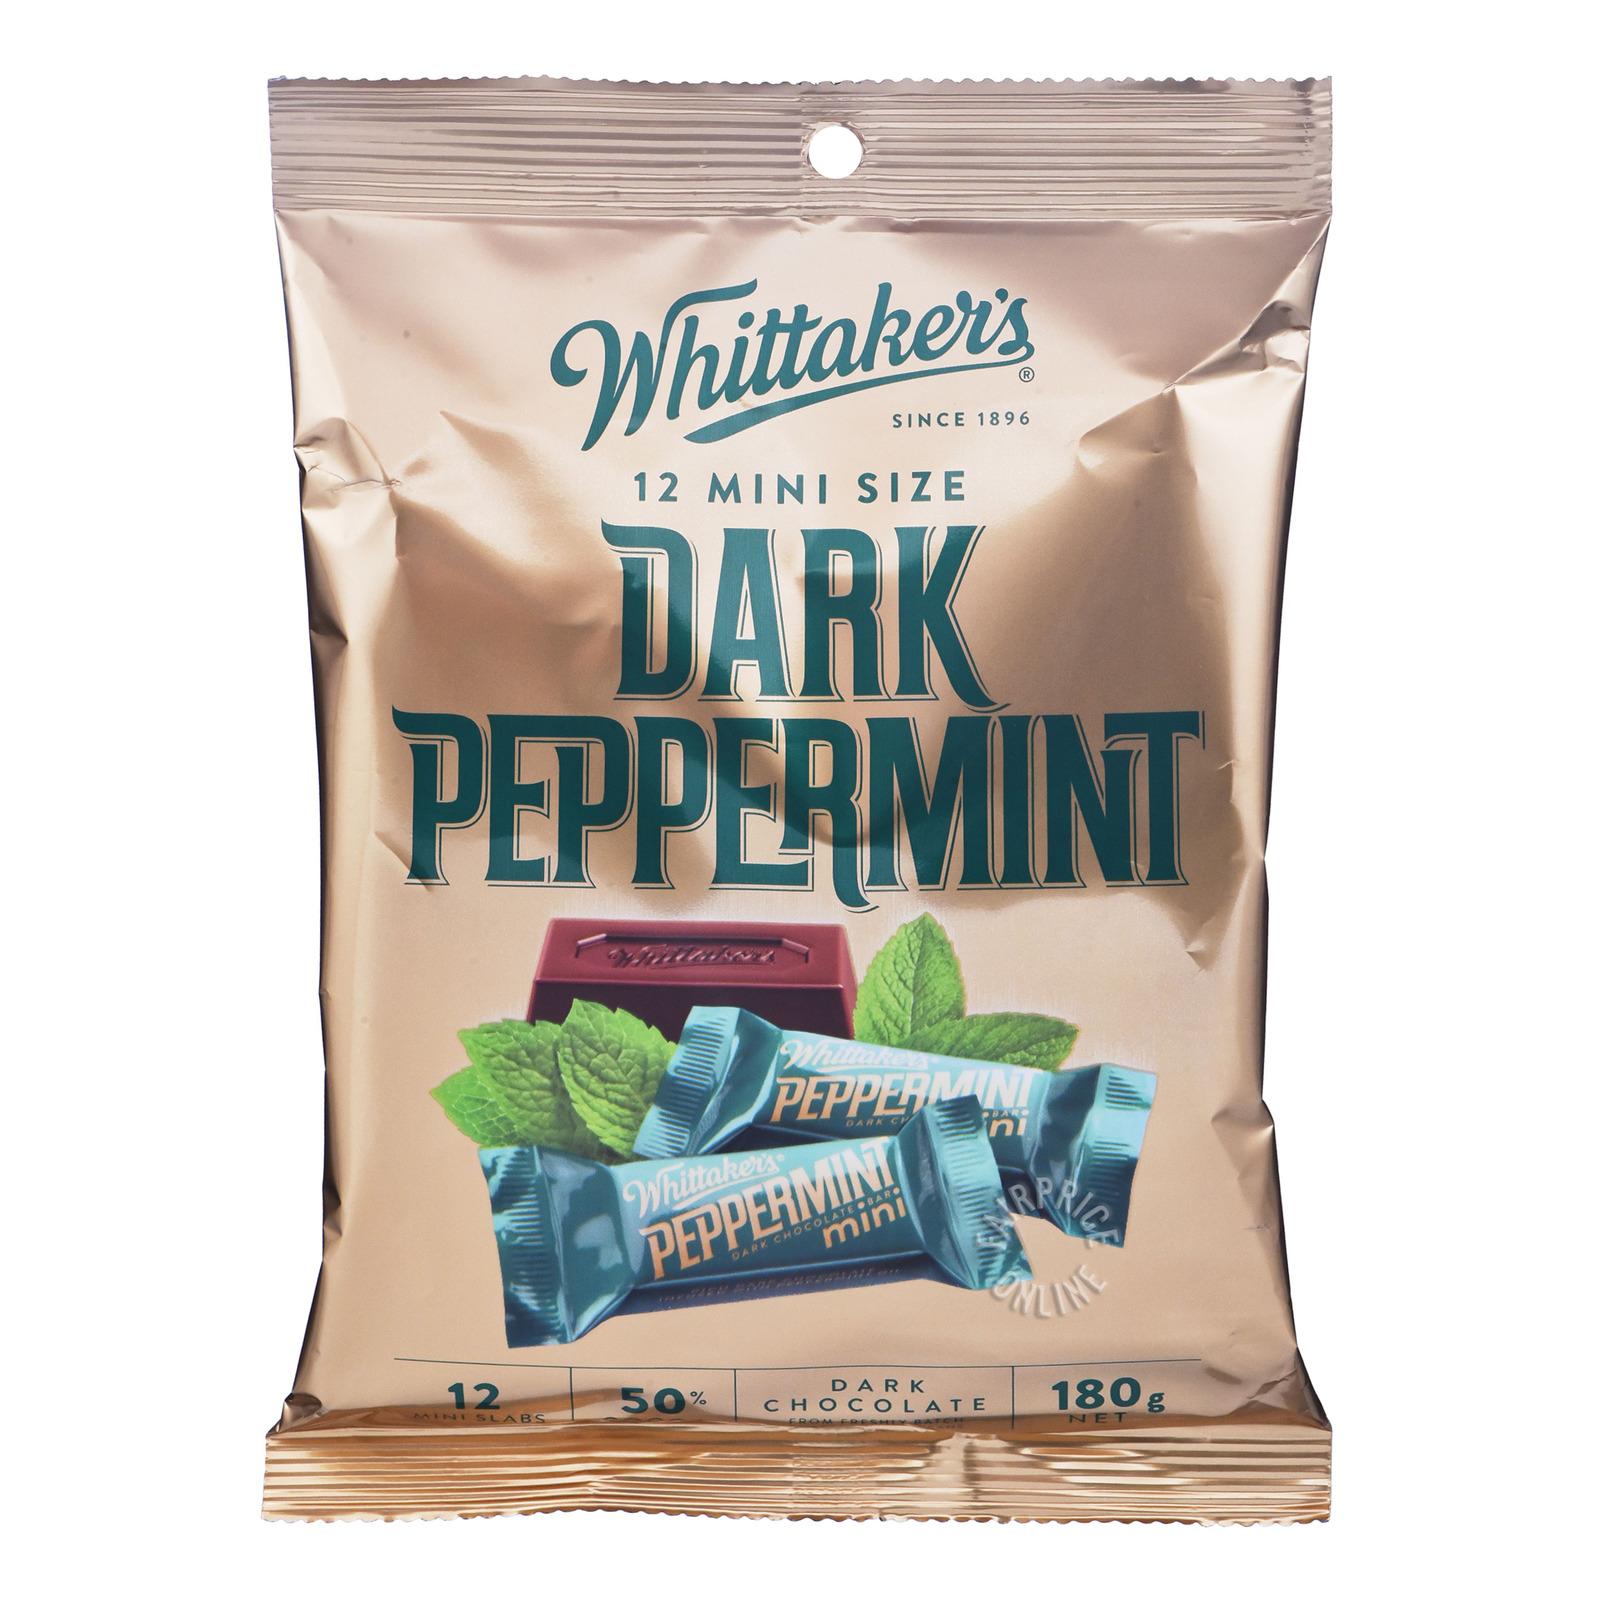 Whittaker's Mini Dark Chocolate Bar - Dark Peppermint